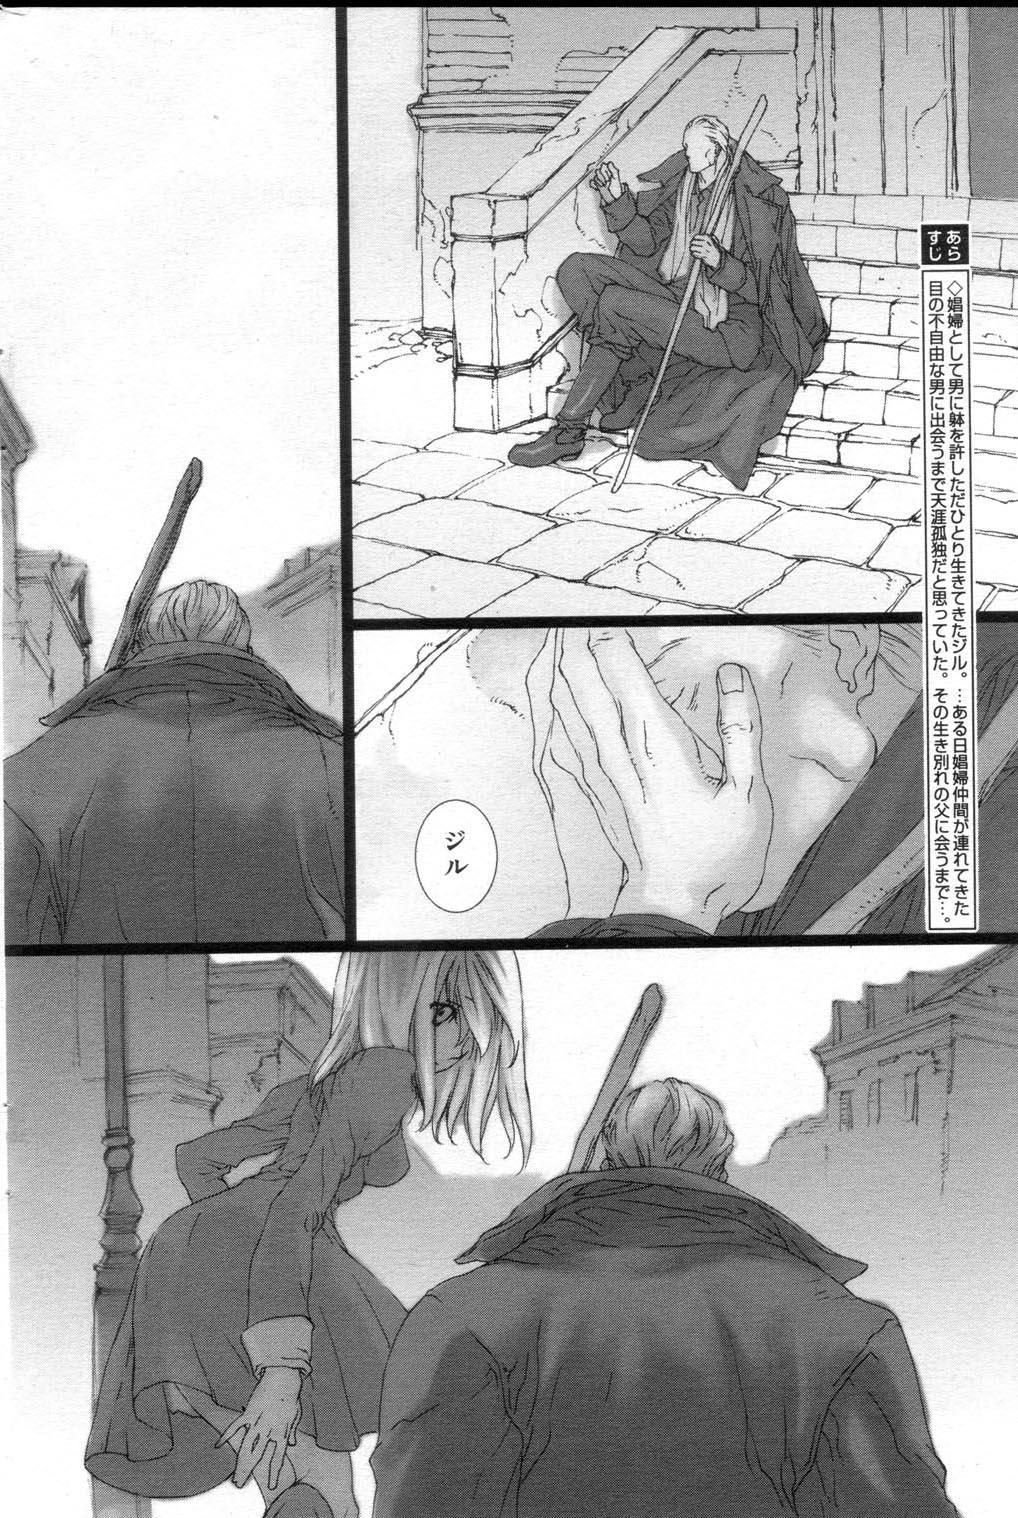 [Saiki Keita] FAIRY GONE GARDEN (Part Two) Kouhen 5